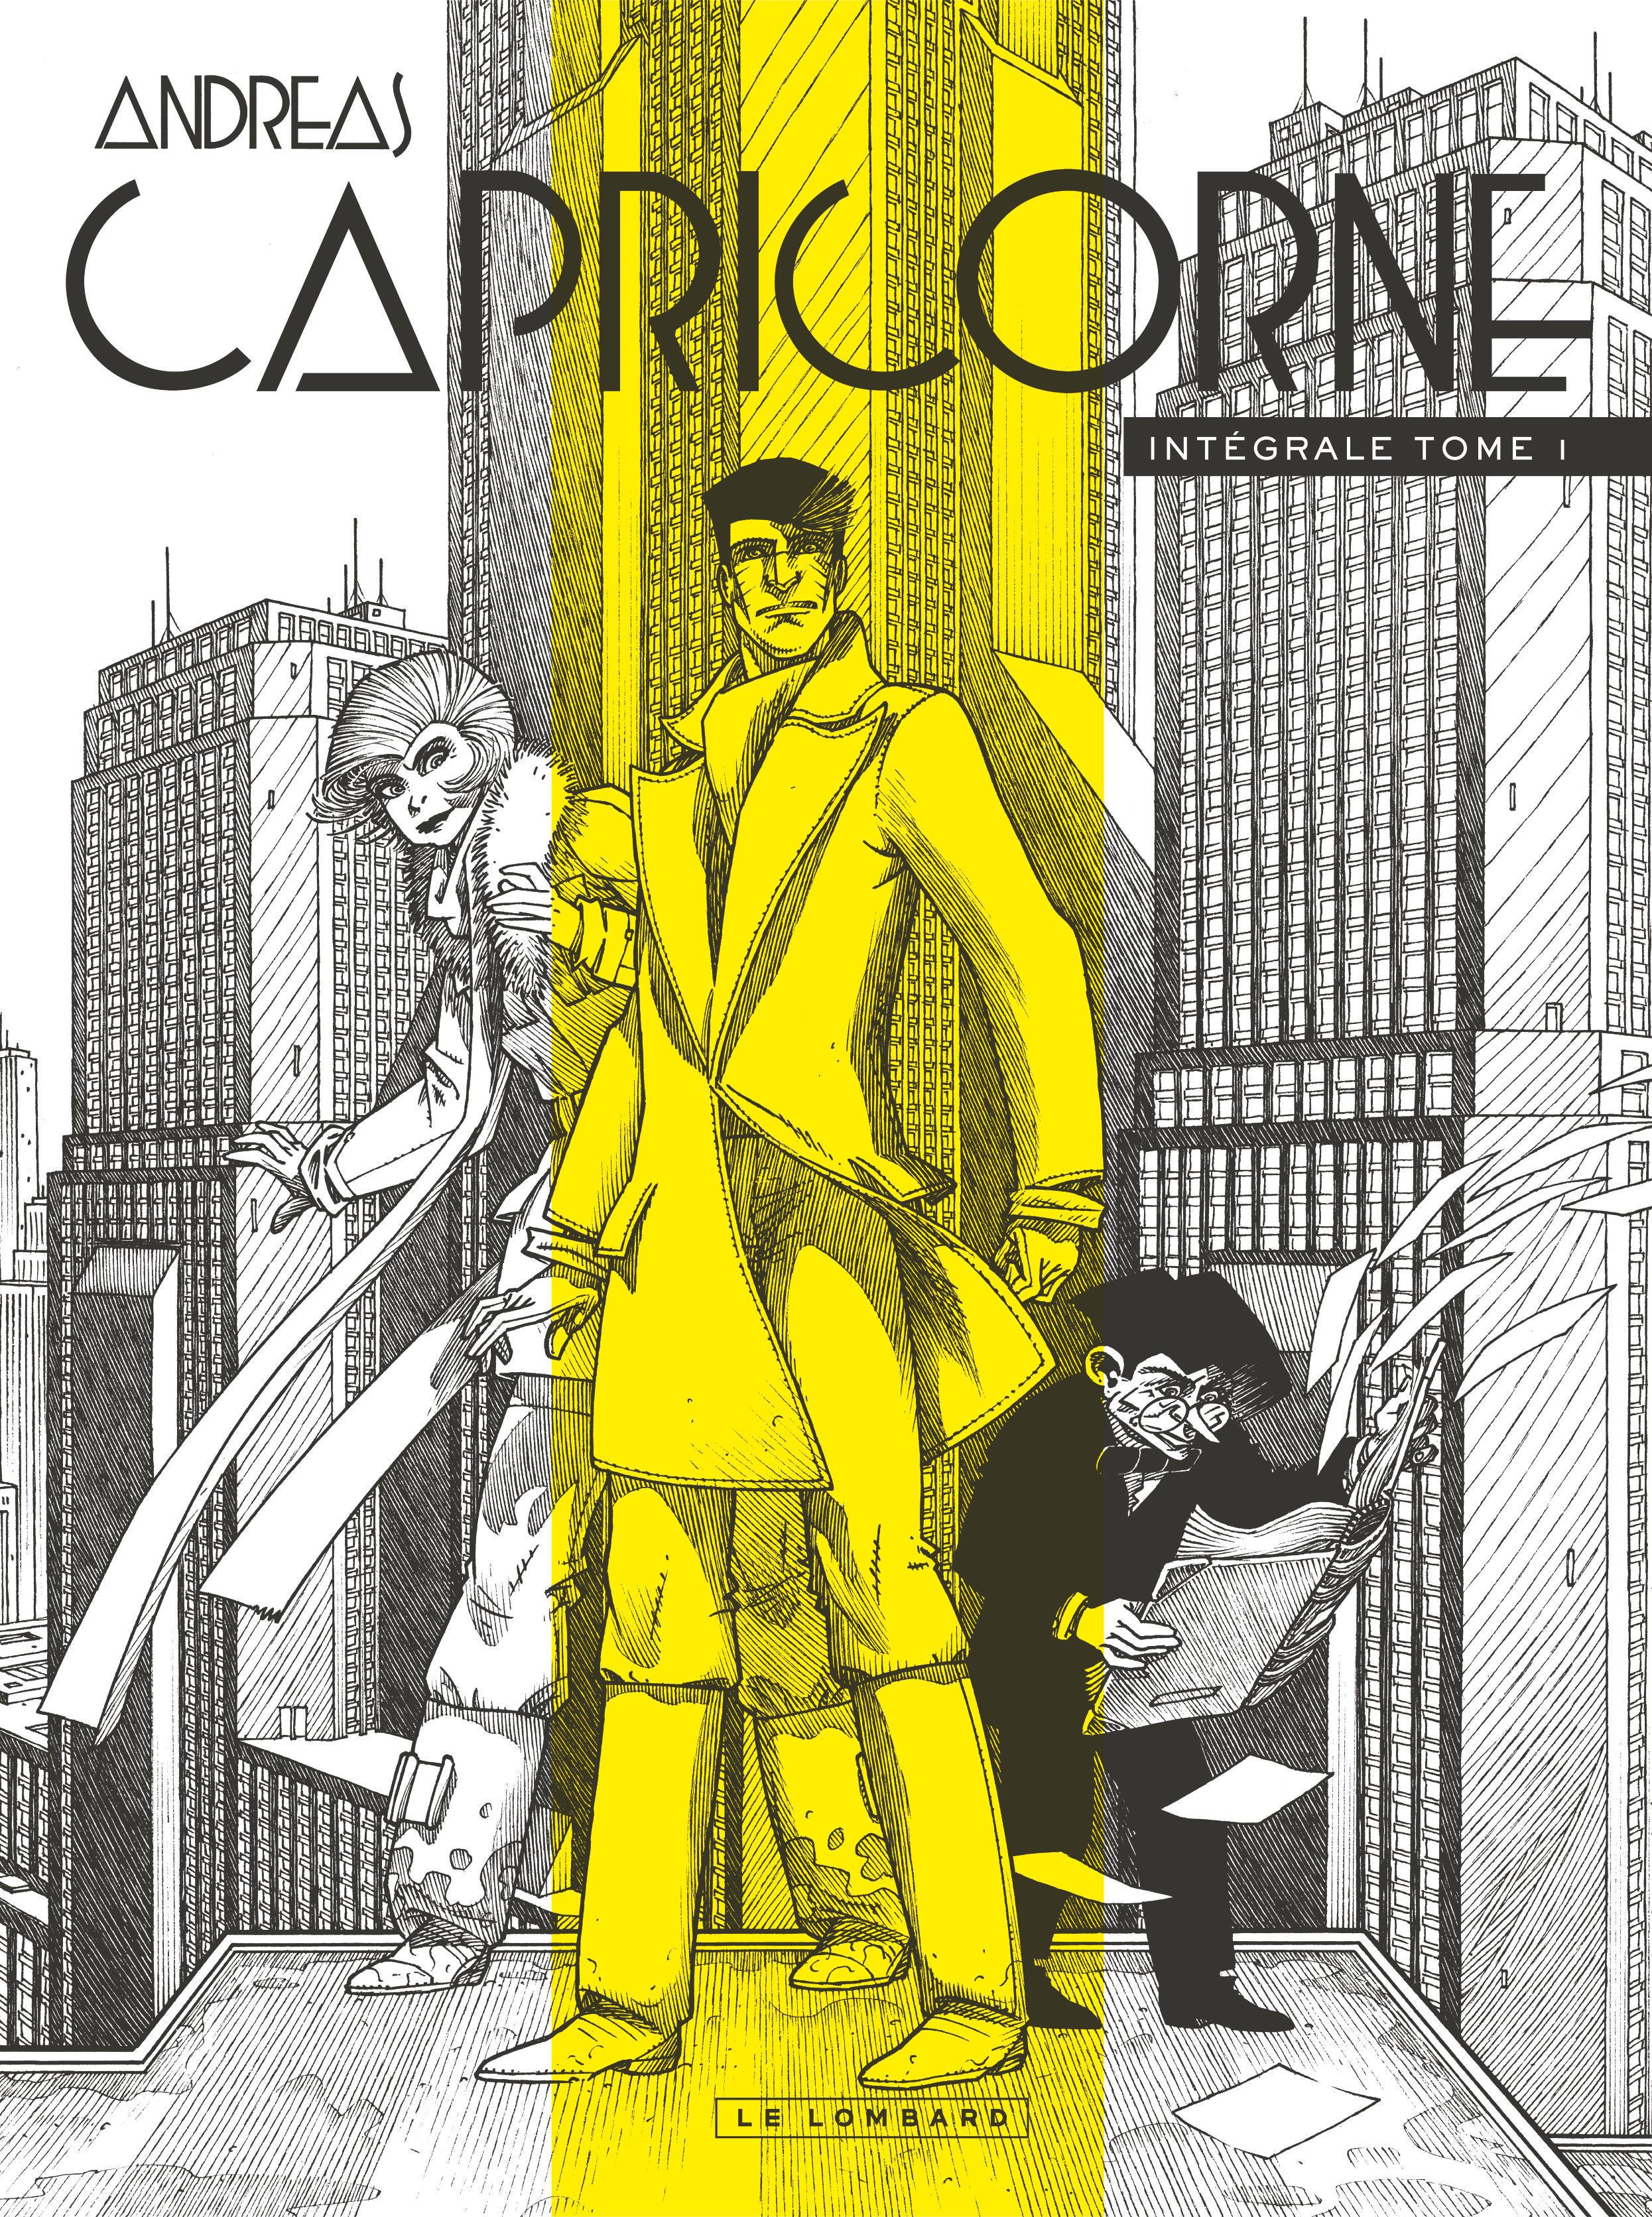 CAPRICORNE - INTEGRALE - TOME 1 - CAPRICORNE INTEGRALE 1